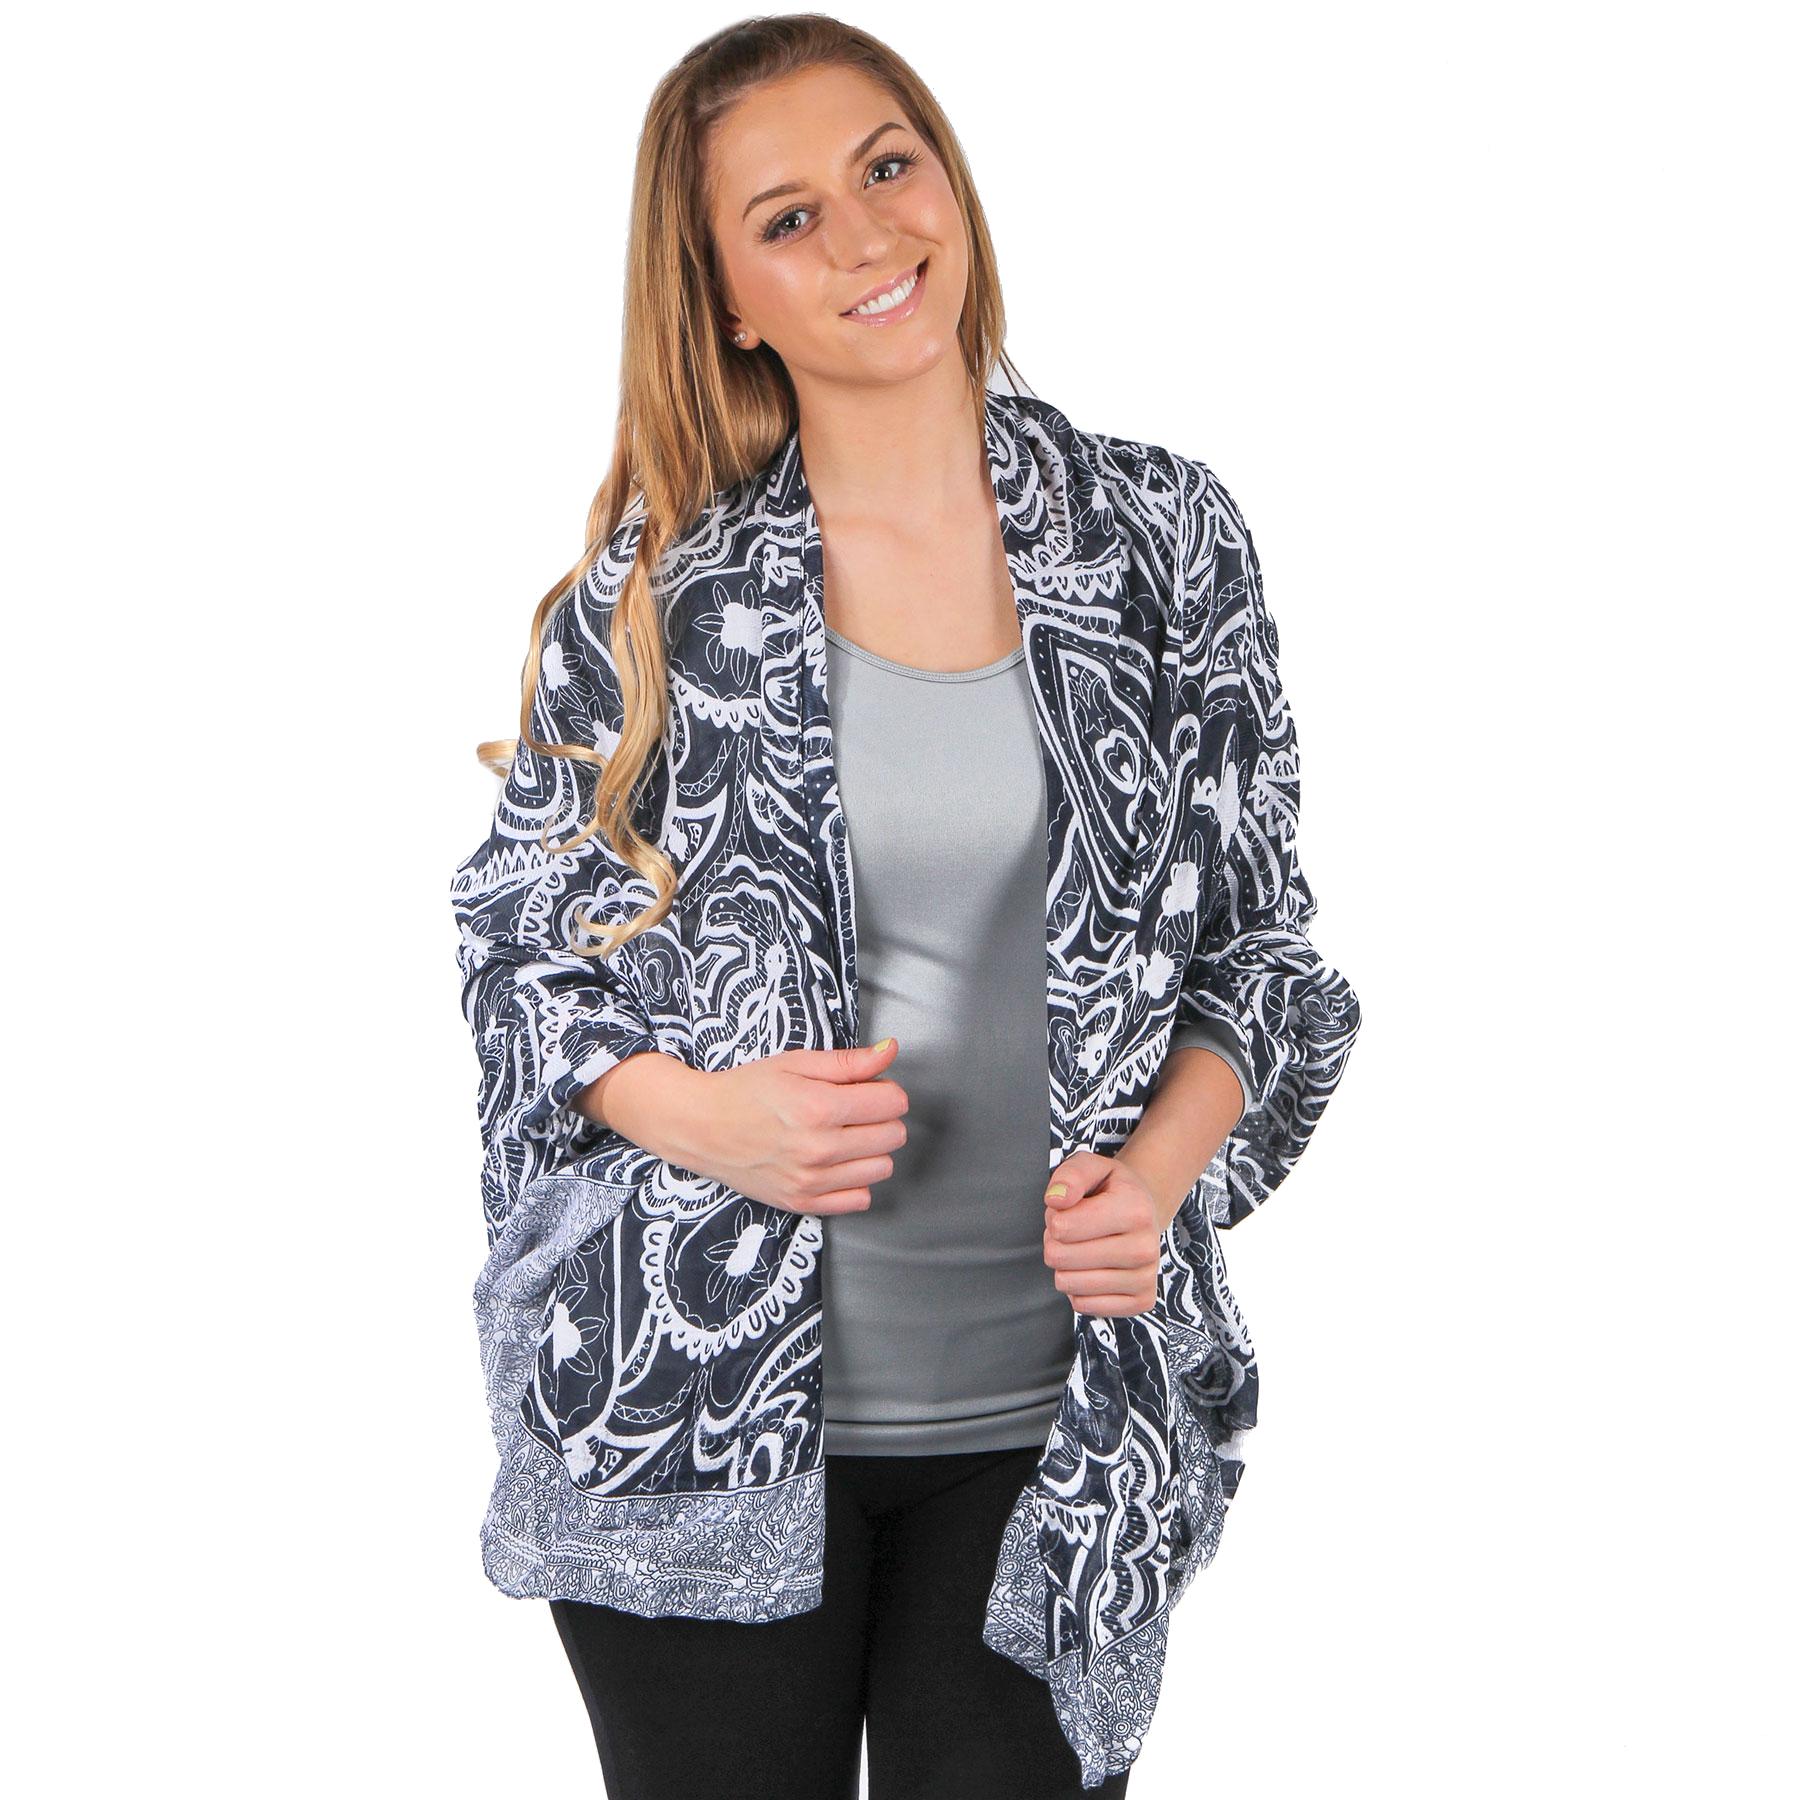 Big Scarves/Shawls - Abstract Paisley Design 4345*